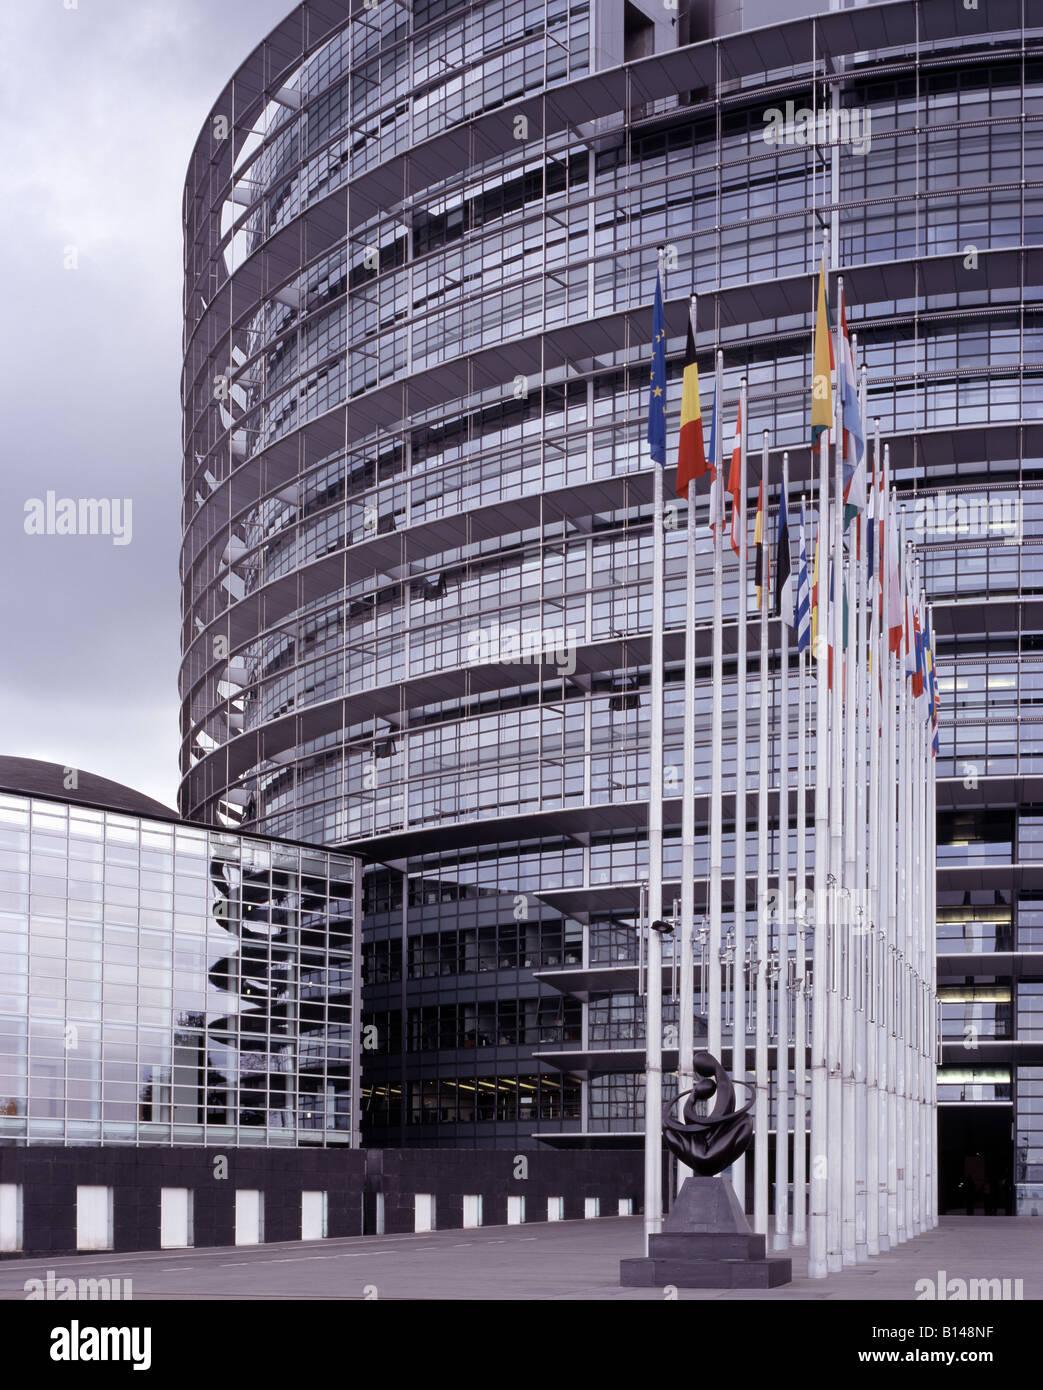 Straßburg, Europaparlament, Eingangsbereich Stockbild